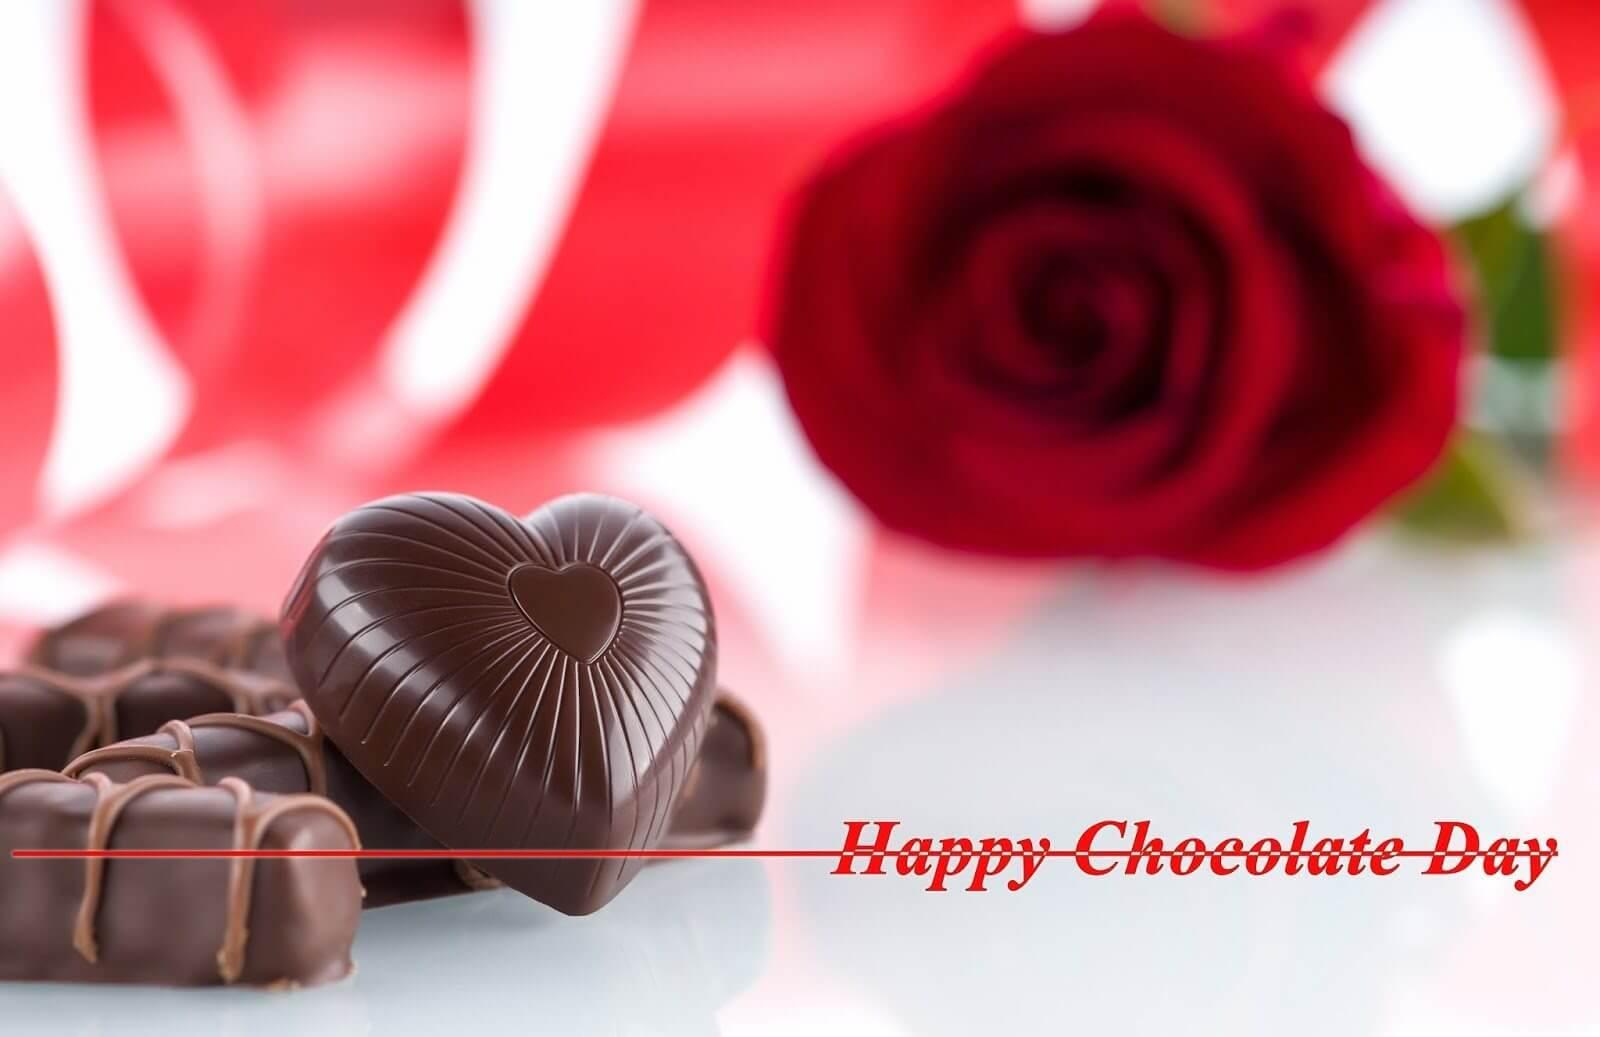 happy chocolate day girl friend heart love feb 9th whats app facebook hd wallpaper